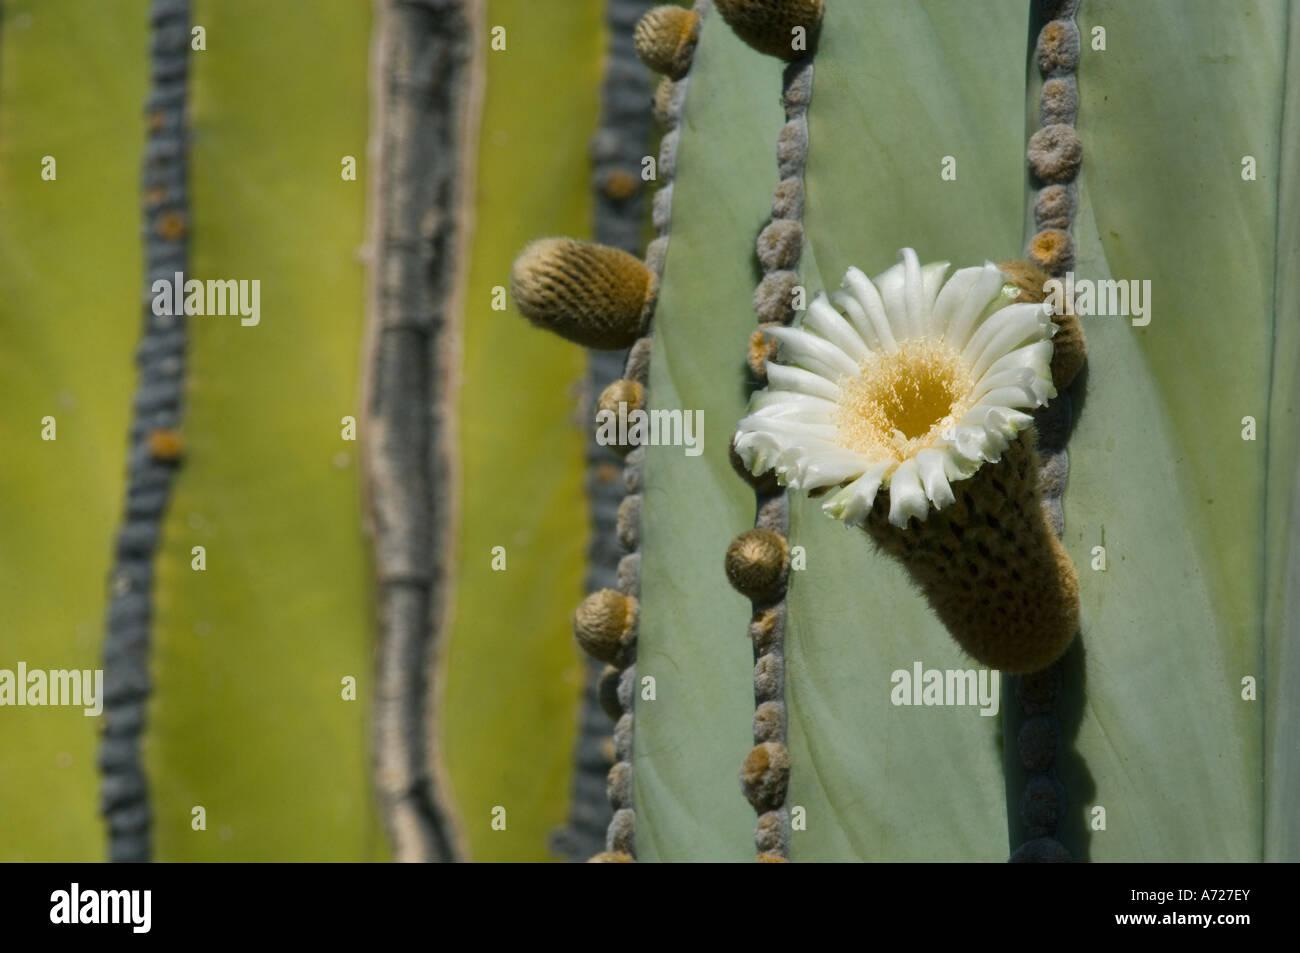 Cardon Cactus flower (Pachycereus pringlei) Baja California, Sea of Cortez, MEXICO - Stock Image